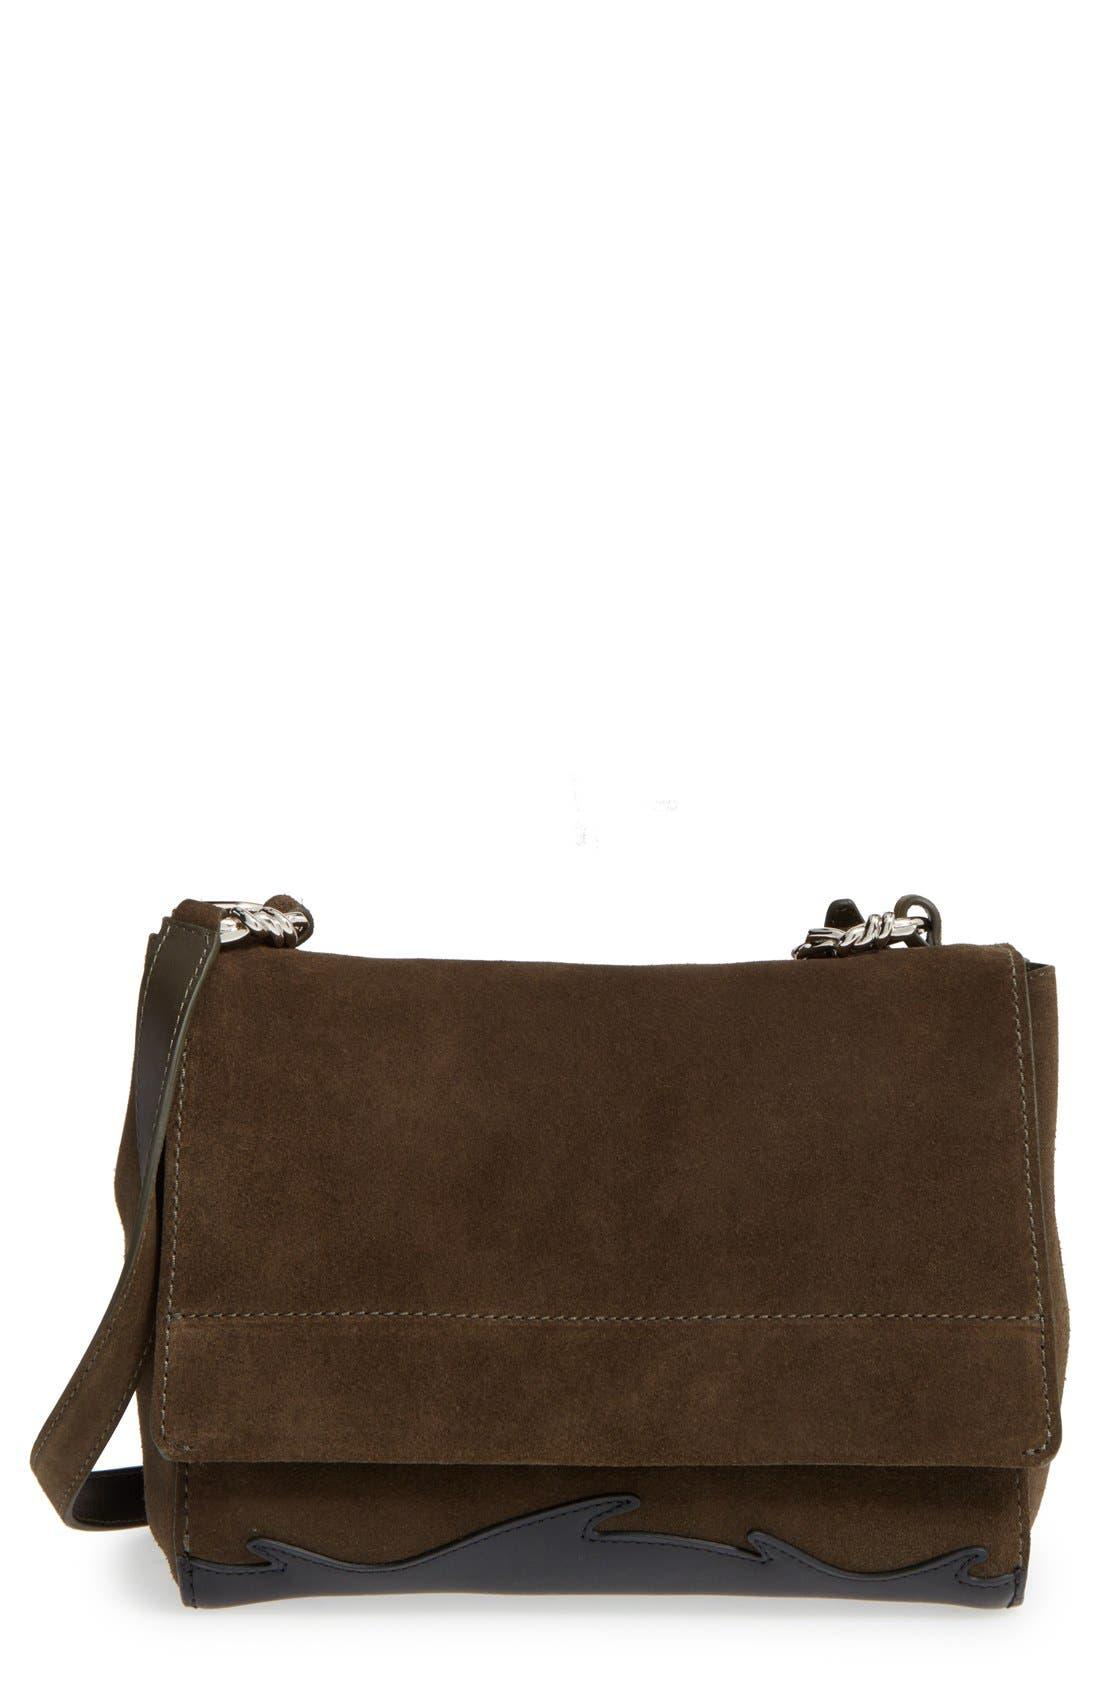 Alternate Image 1 Selected - 3.1 Phillip Lim 'Ames - Patchwork' Leather Crossbody Bag